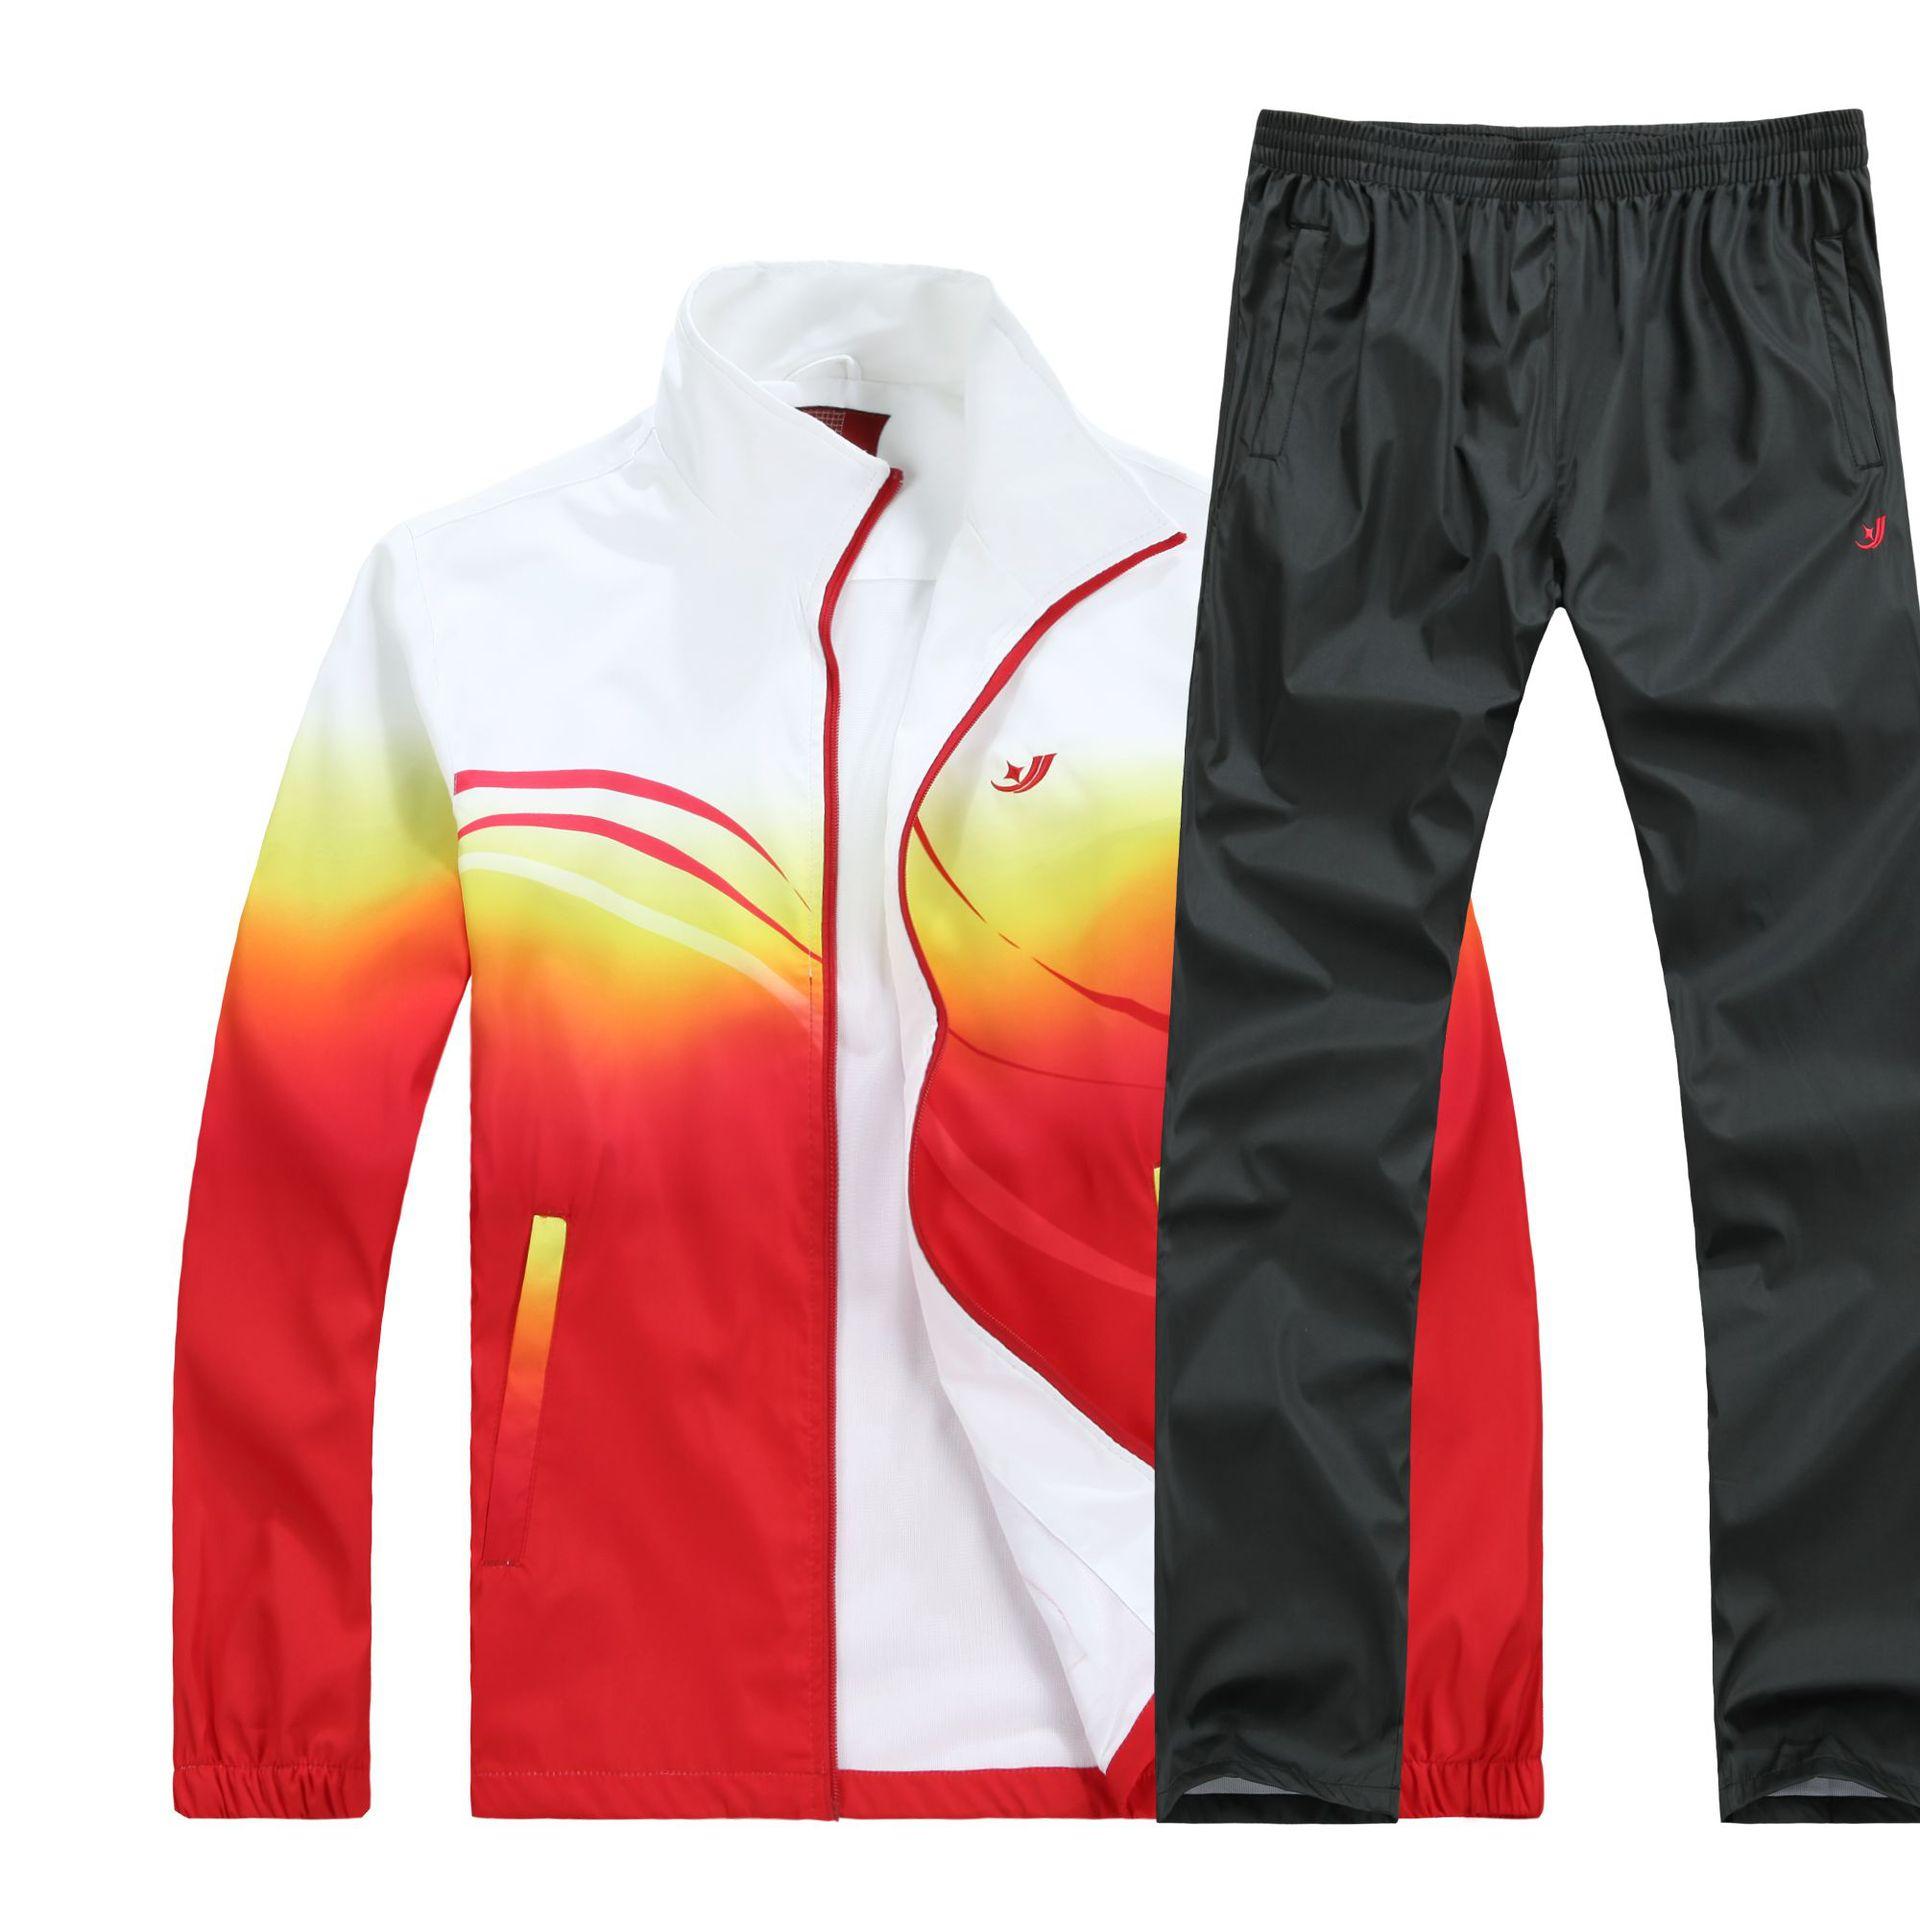 Men's Sets Two-piece Suite Autumn Sportswear Outerwear Men's Wear Pants 5XL Windproof Casual Coat Leisure Solid MOOWNUC 2019 New